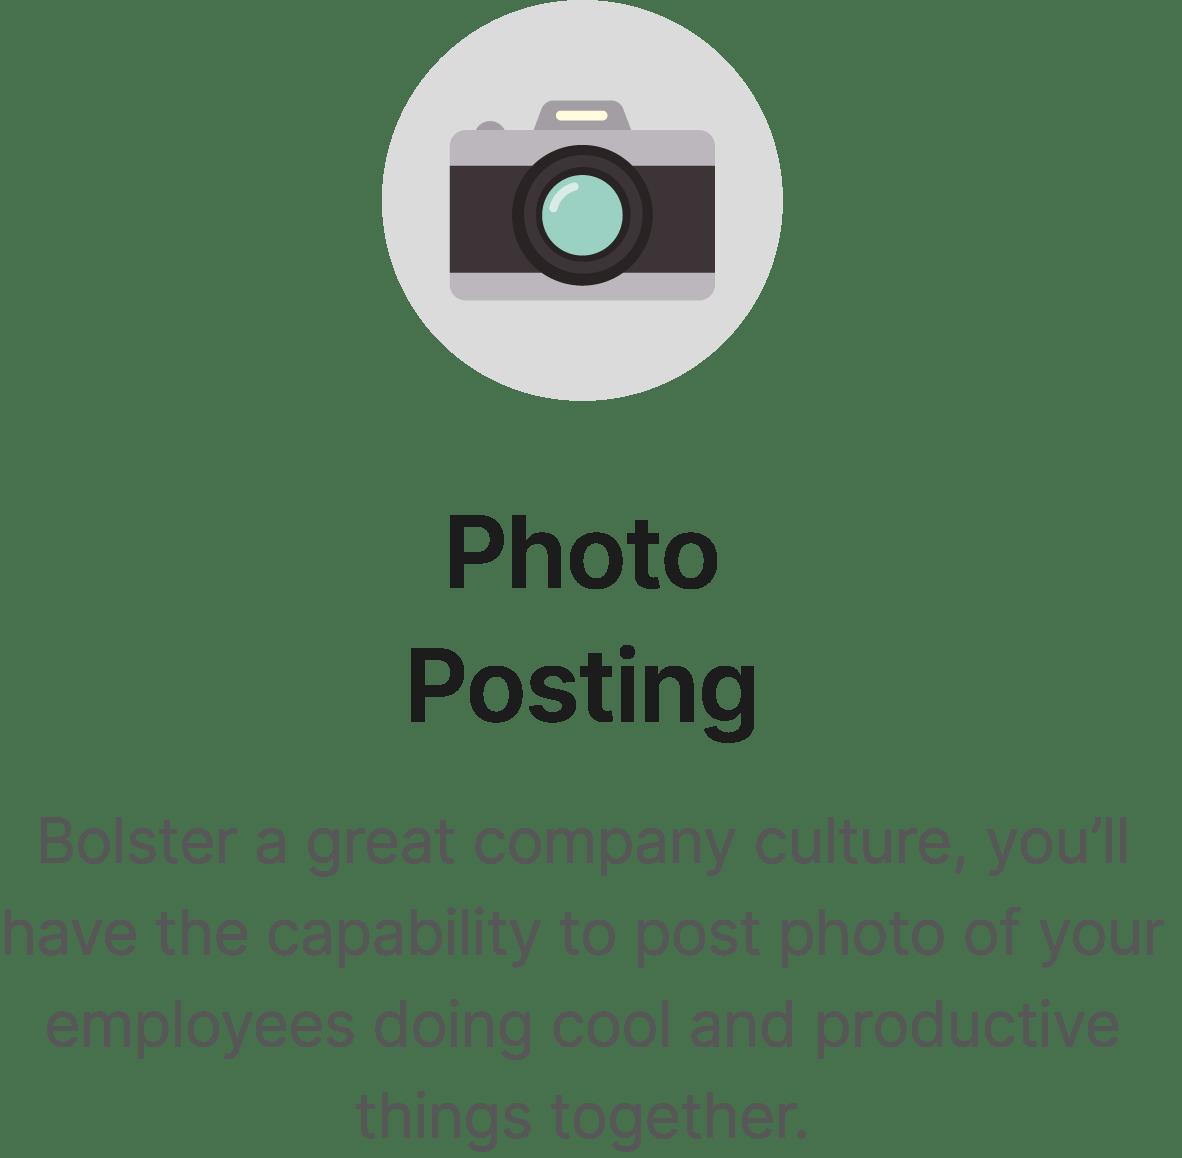 PhotoPosting